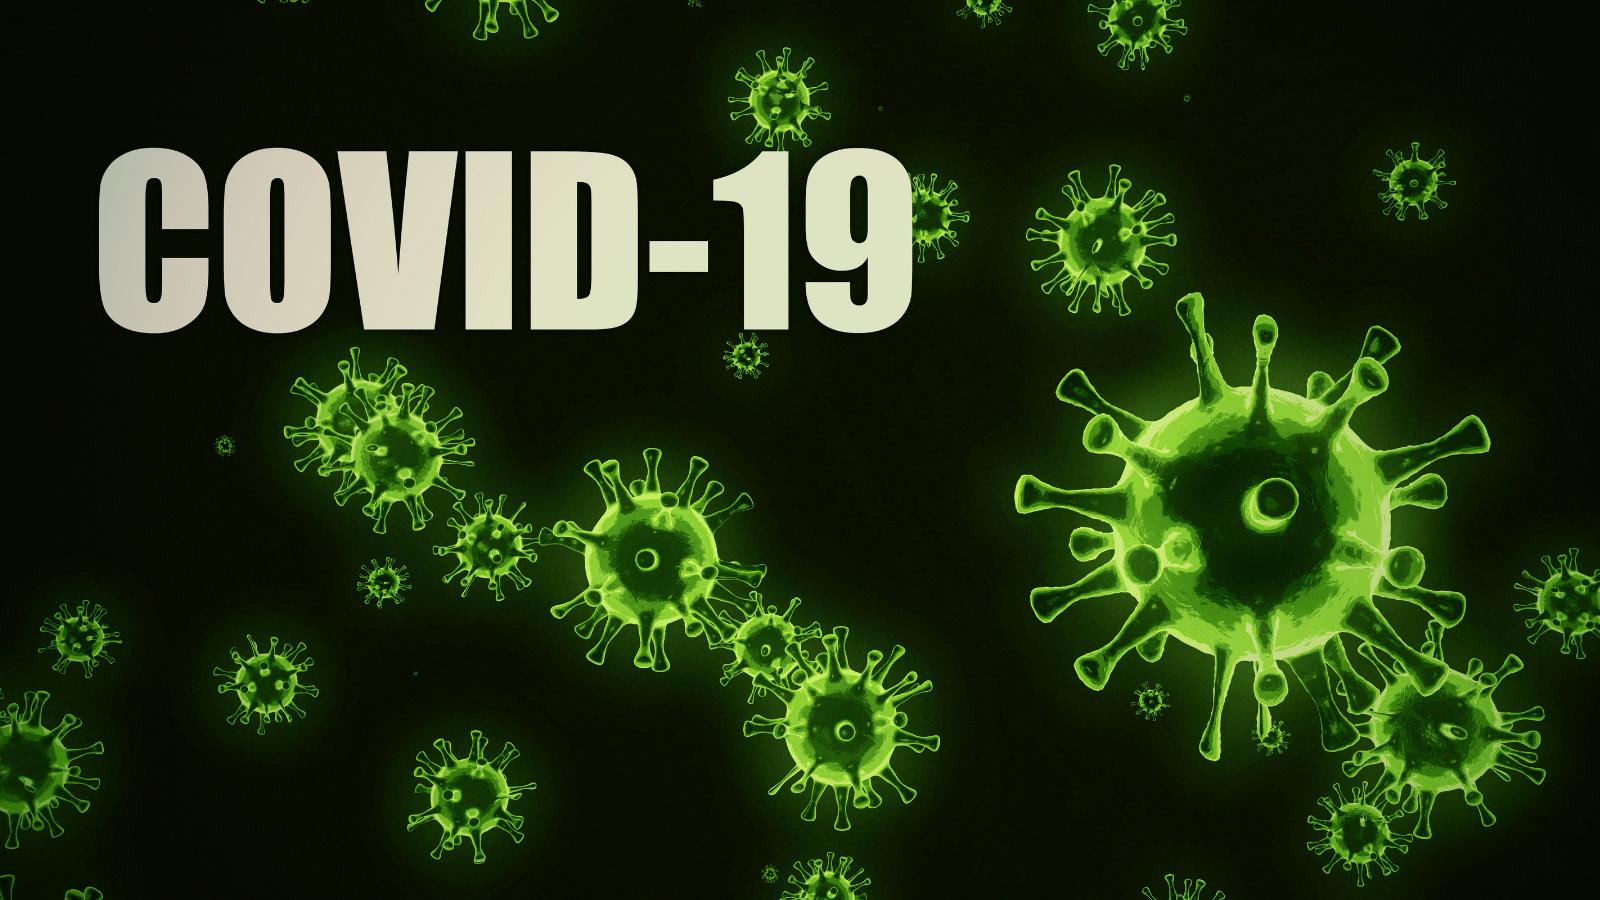 COVID-19 with image of artist drawing of coronavirus.